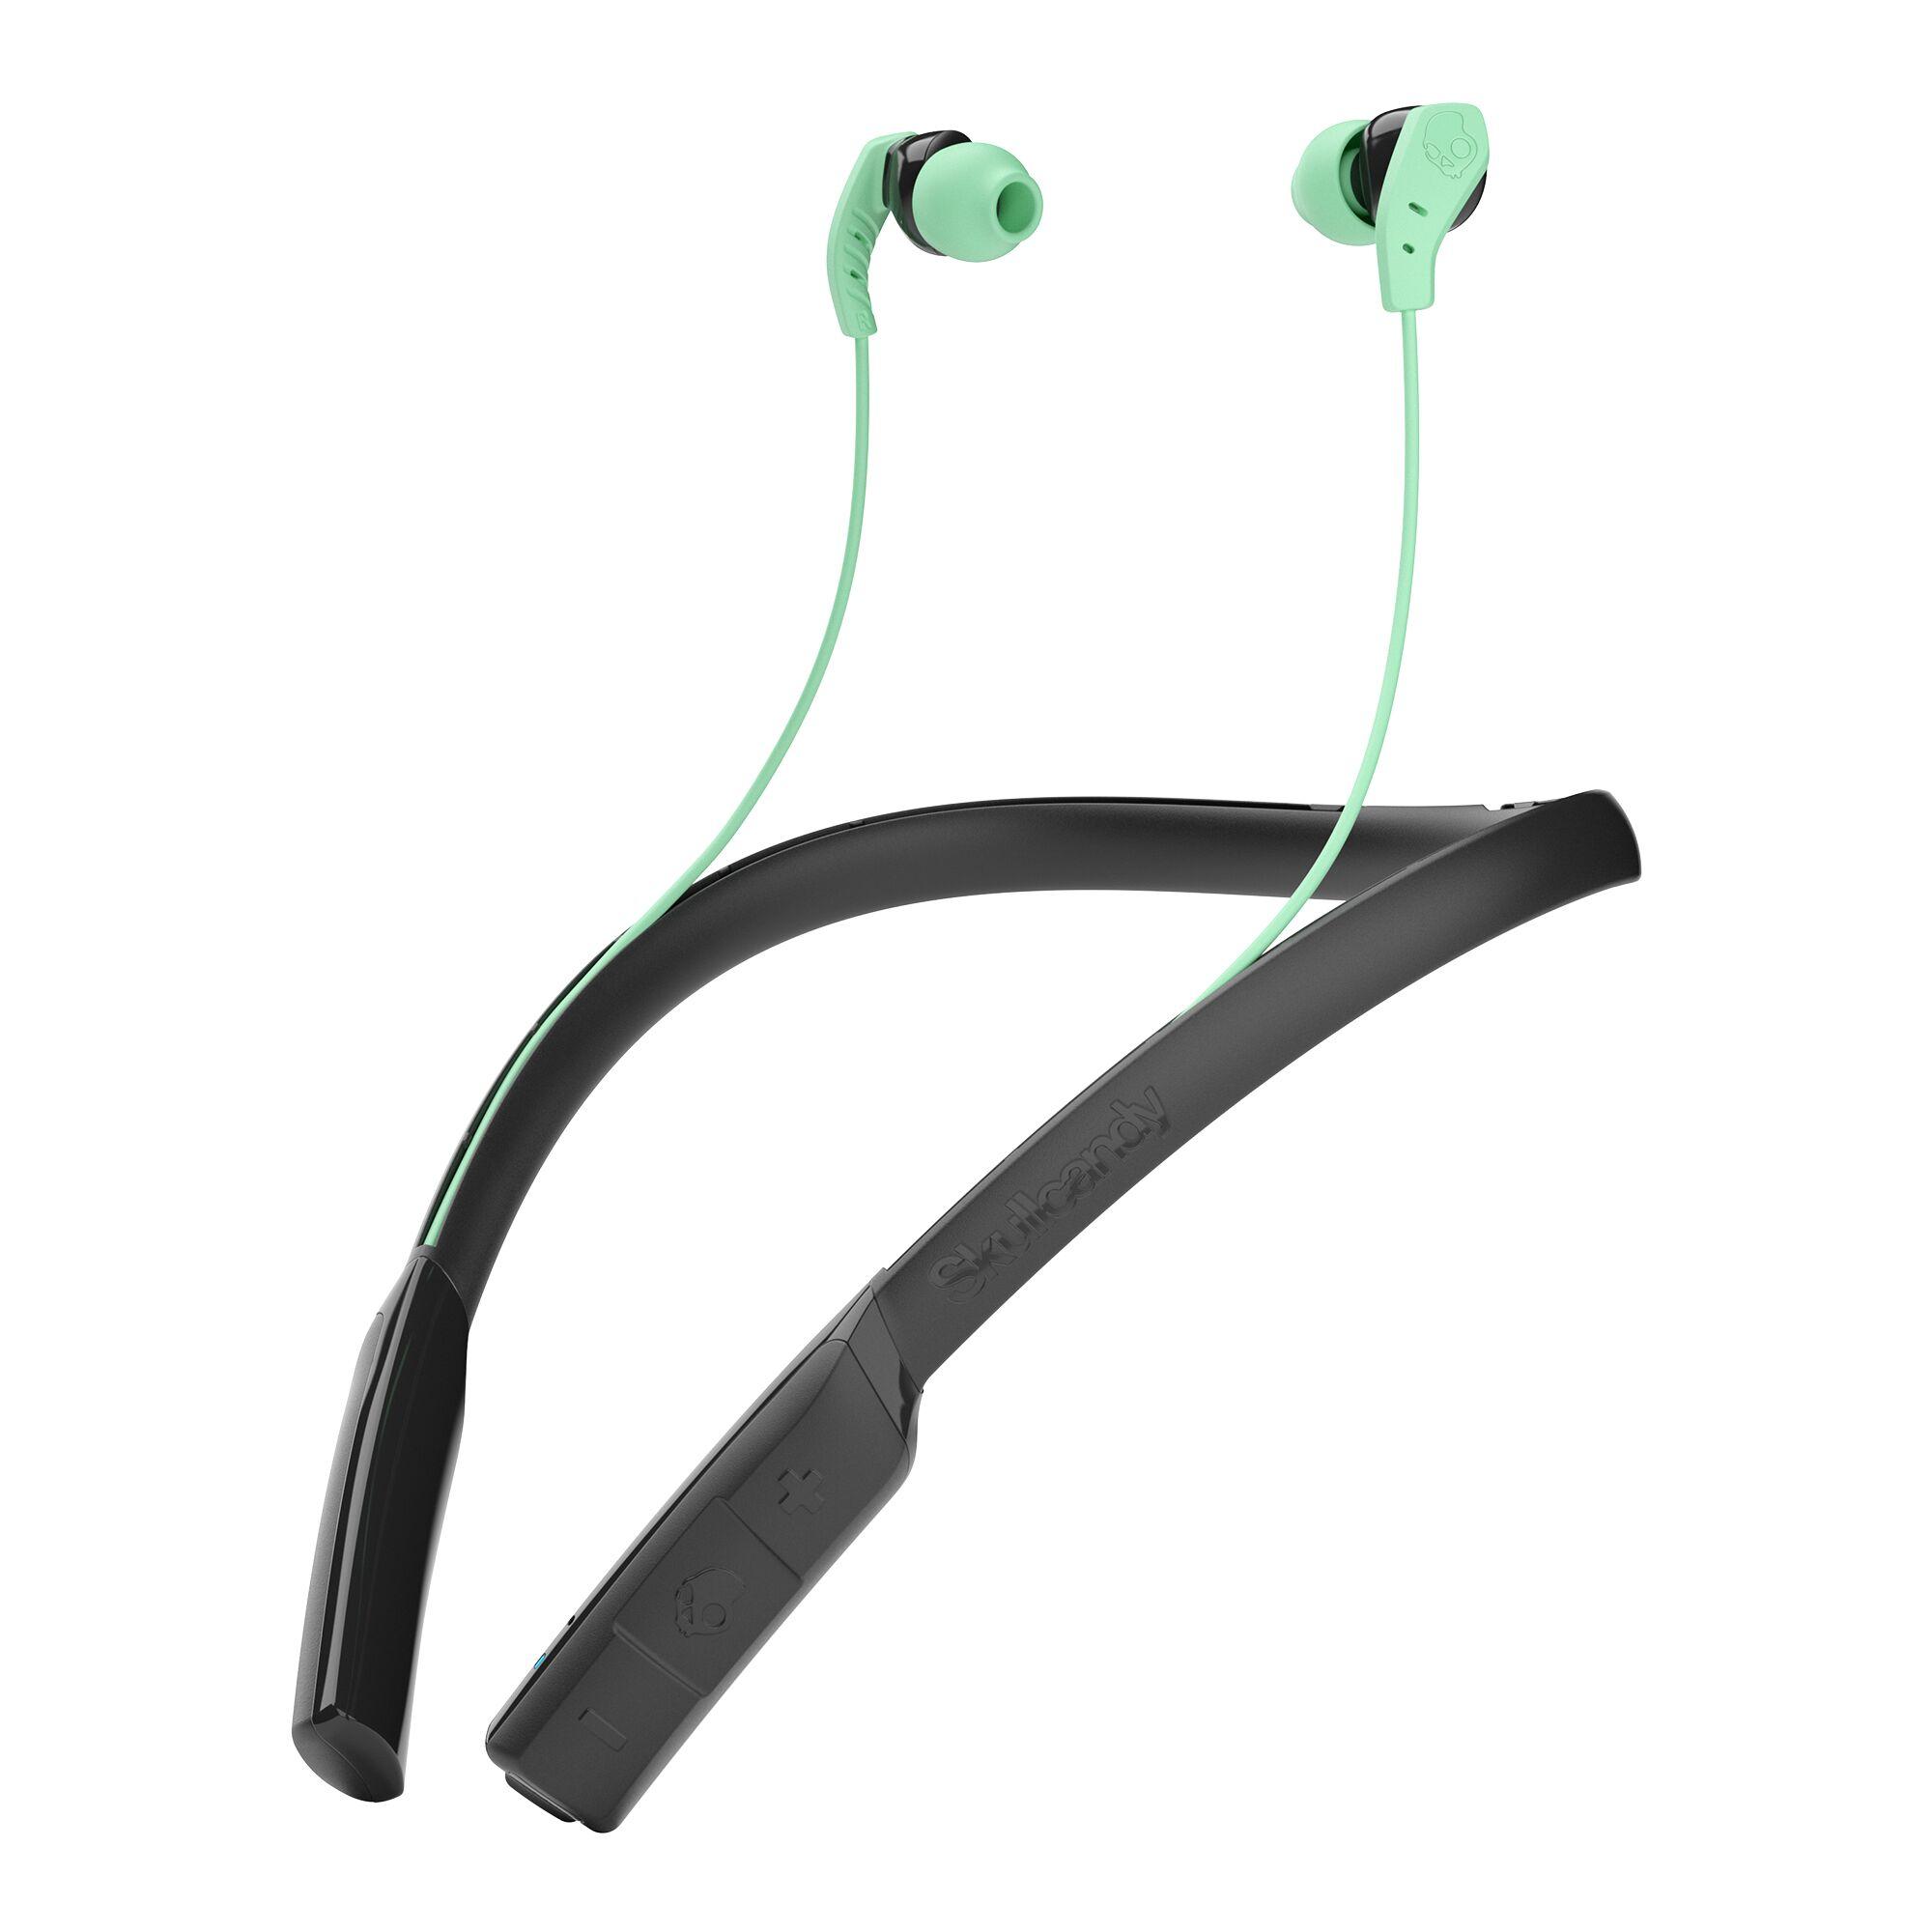 c1c4d30960d Skullcandy Method Wireless Bluetooth Earbuds for Running